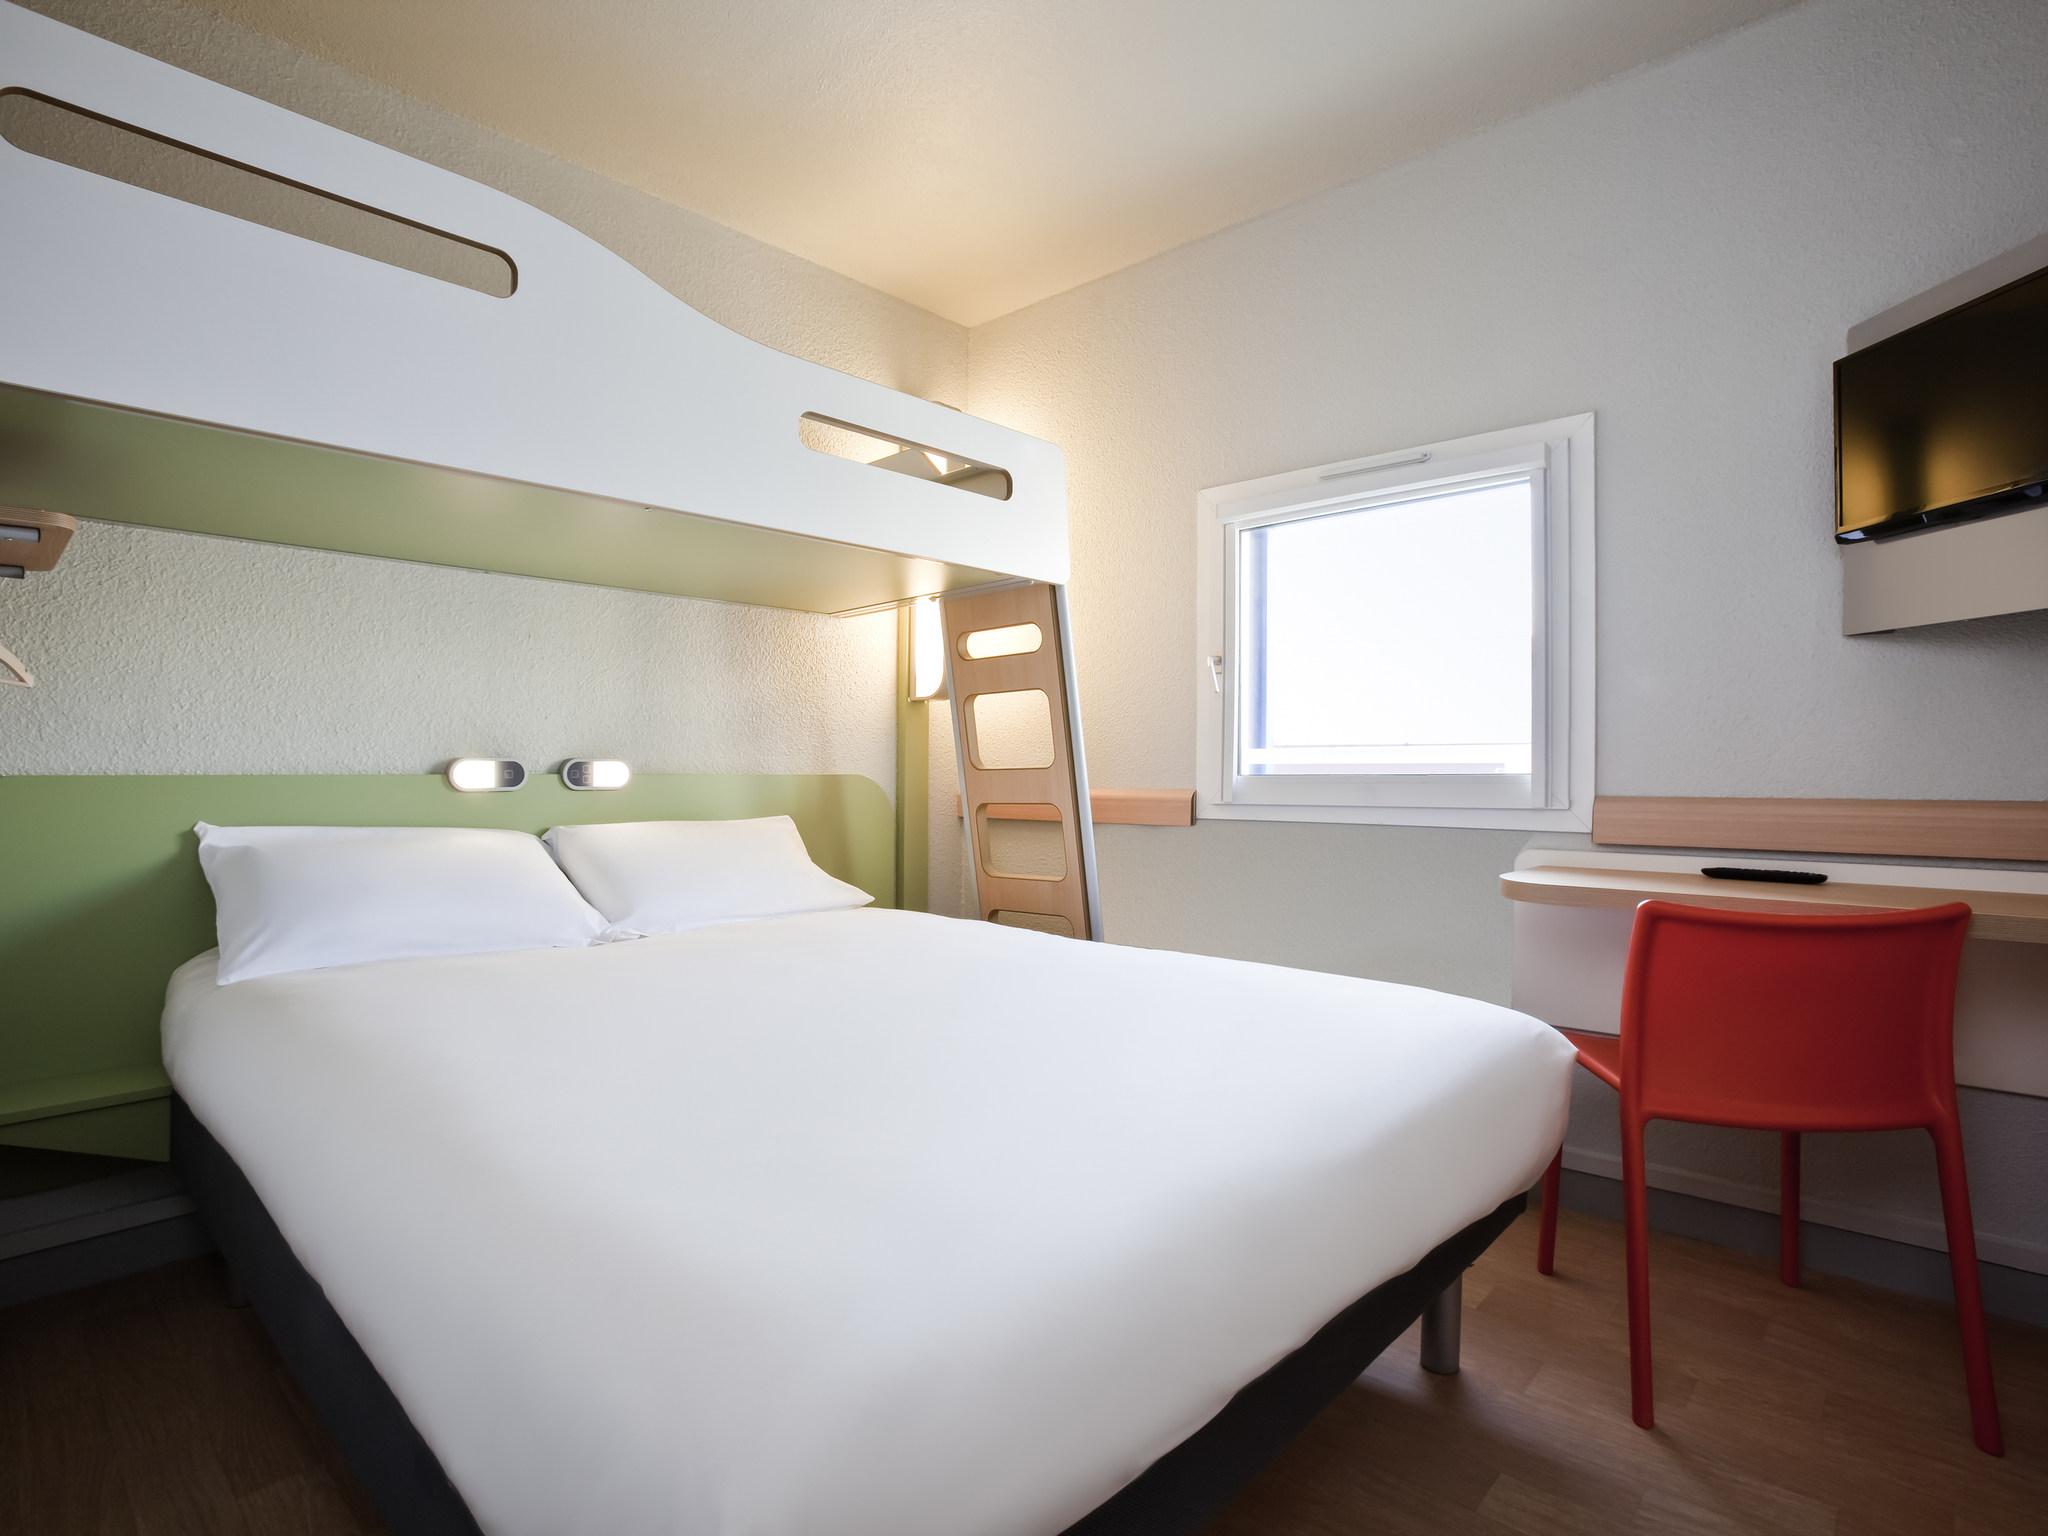 فندق - ibis budget Pontault-Combault RN4 Marne-la-Vallée